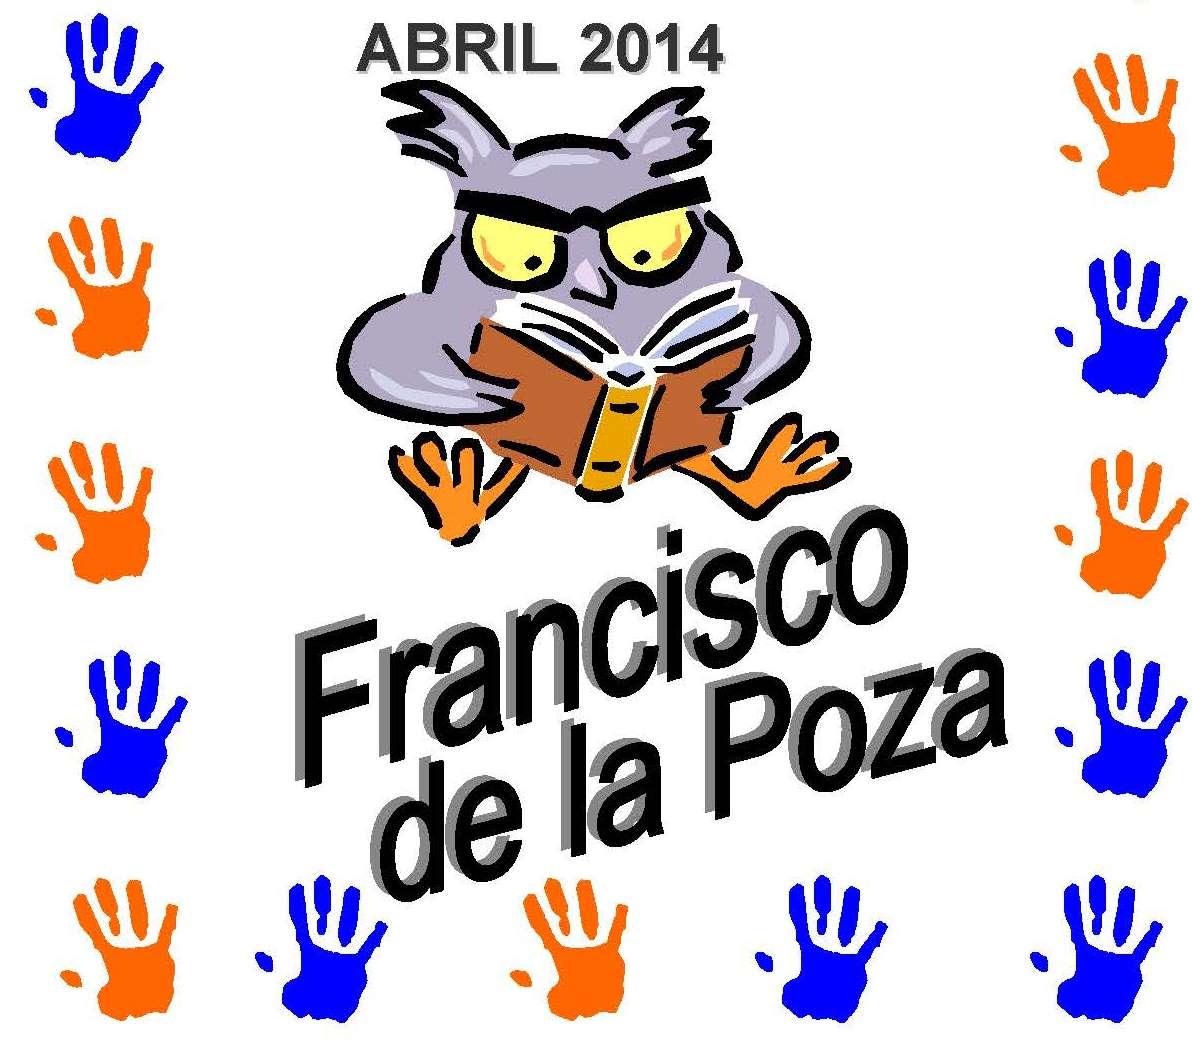 concurso-literario-fpoza-2014-rec1.jpg - 127.12 KB